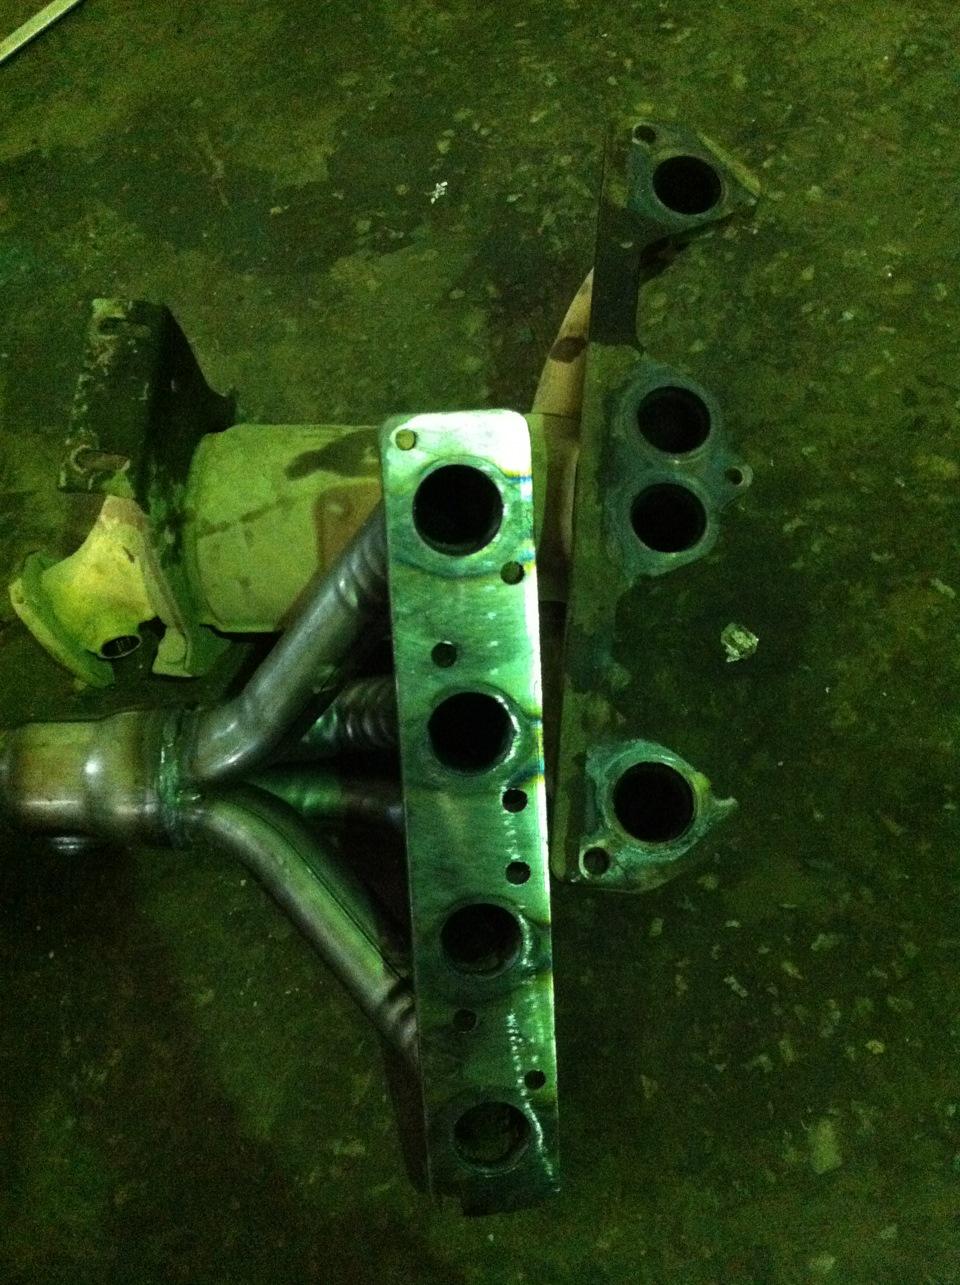 Фото №6 - запах выхлопных газов в салоне ВАЗ 2110